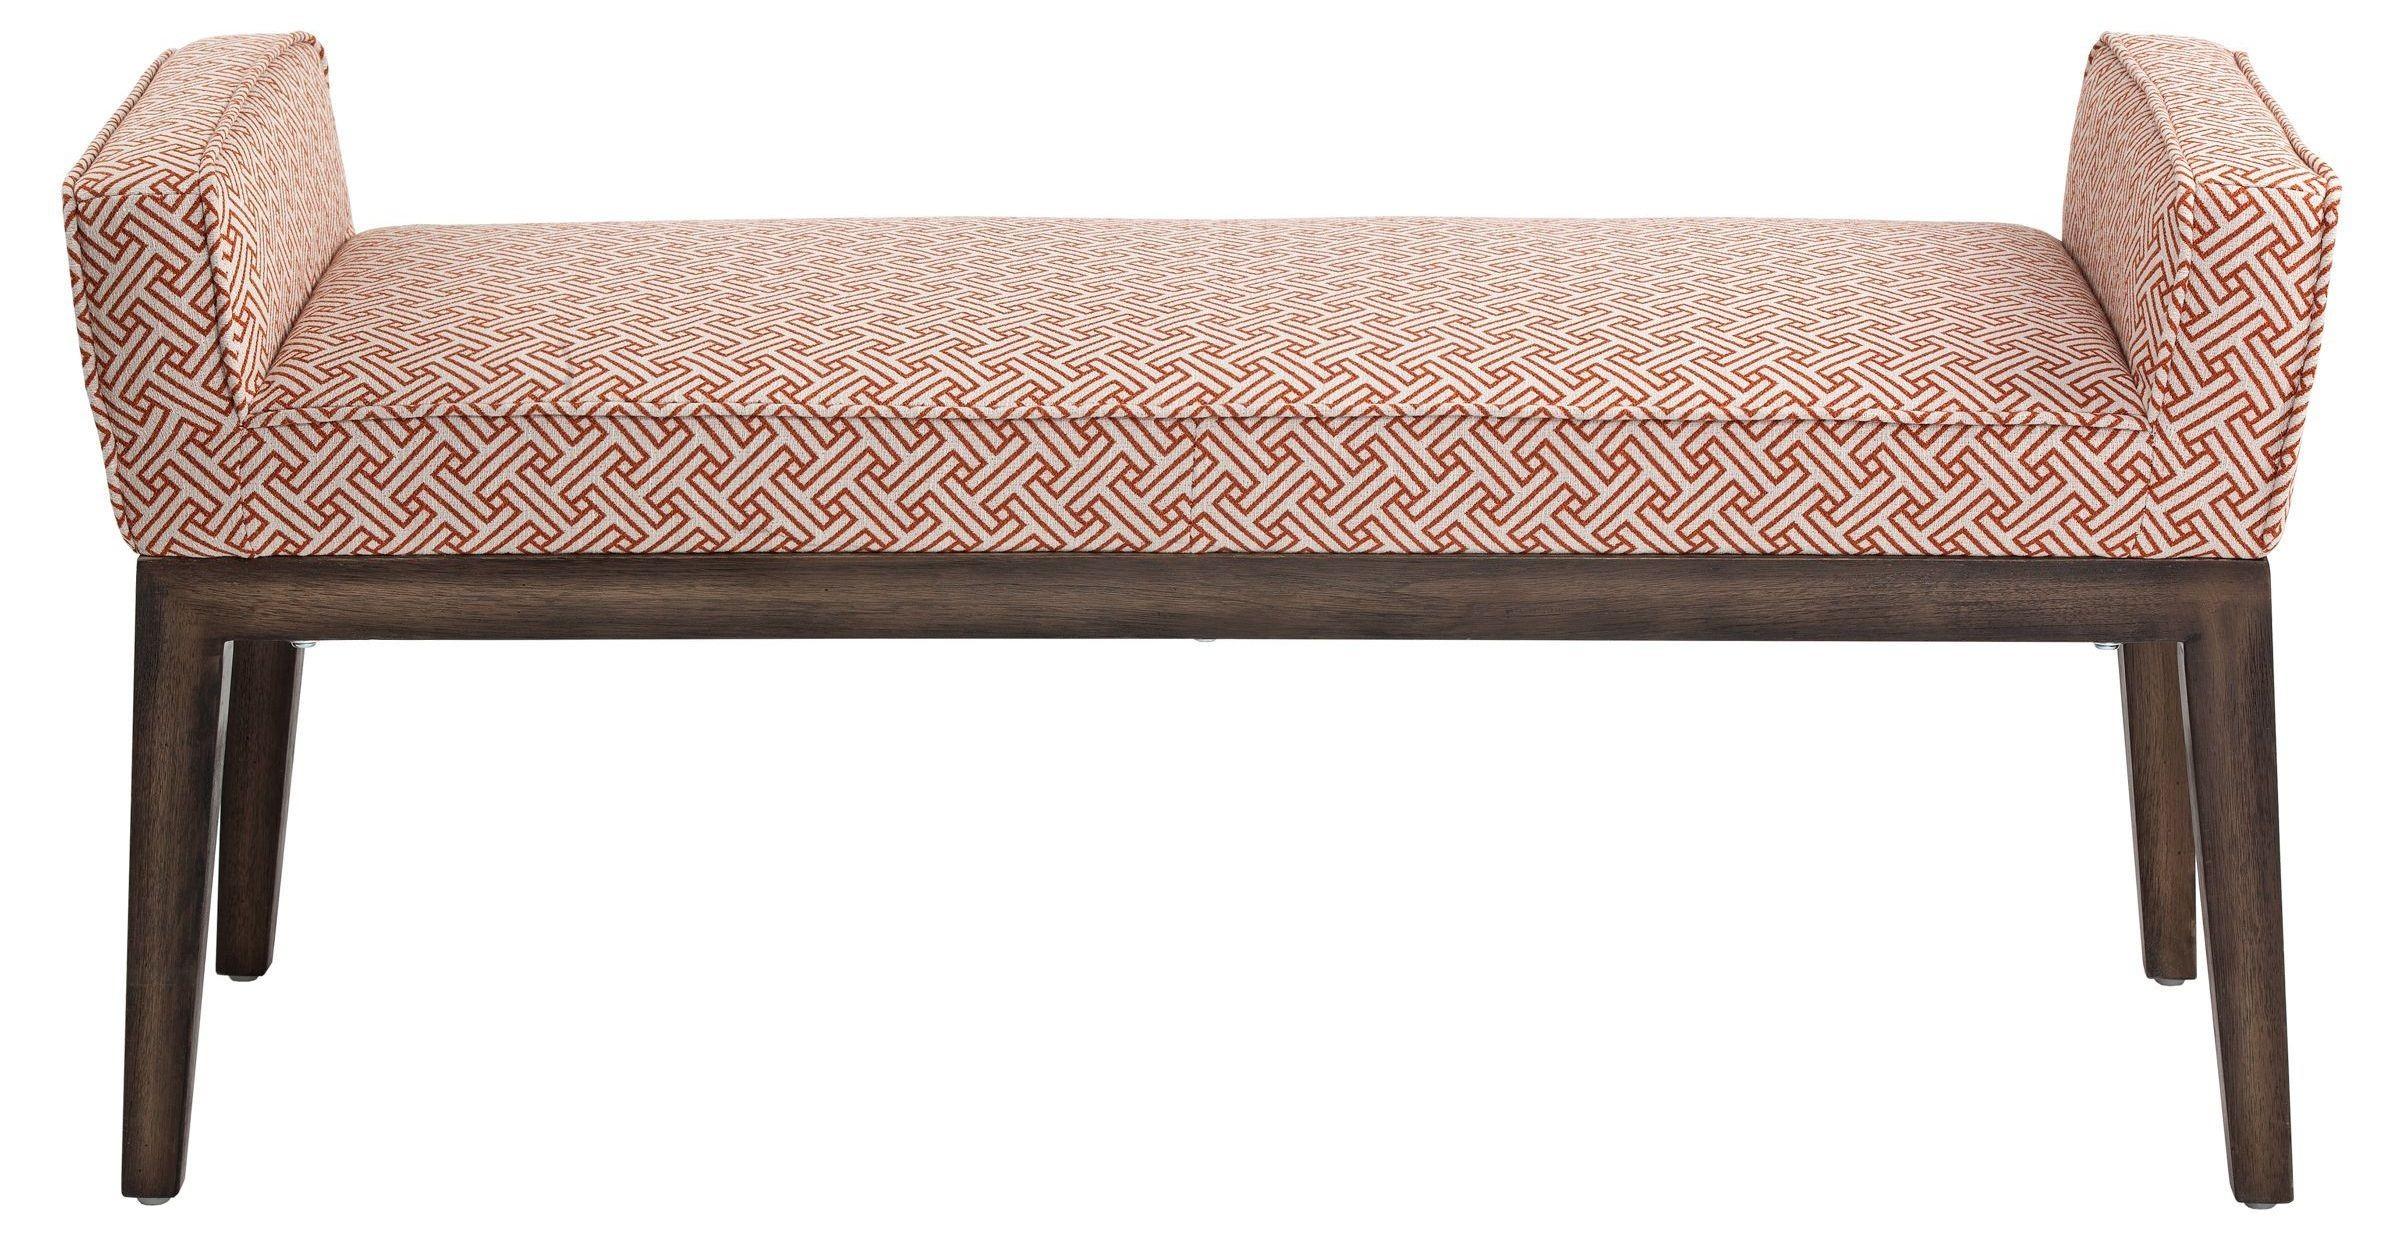 Harrod Stencil Orange Fabric Bench From Sunpan 100389 Coleman Furniture